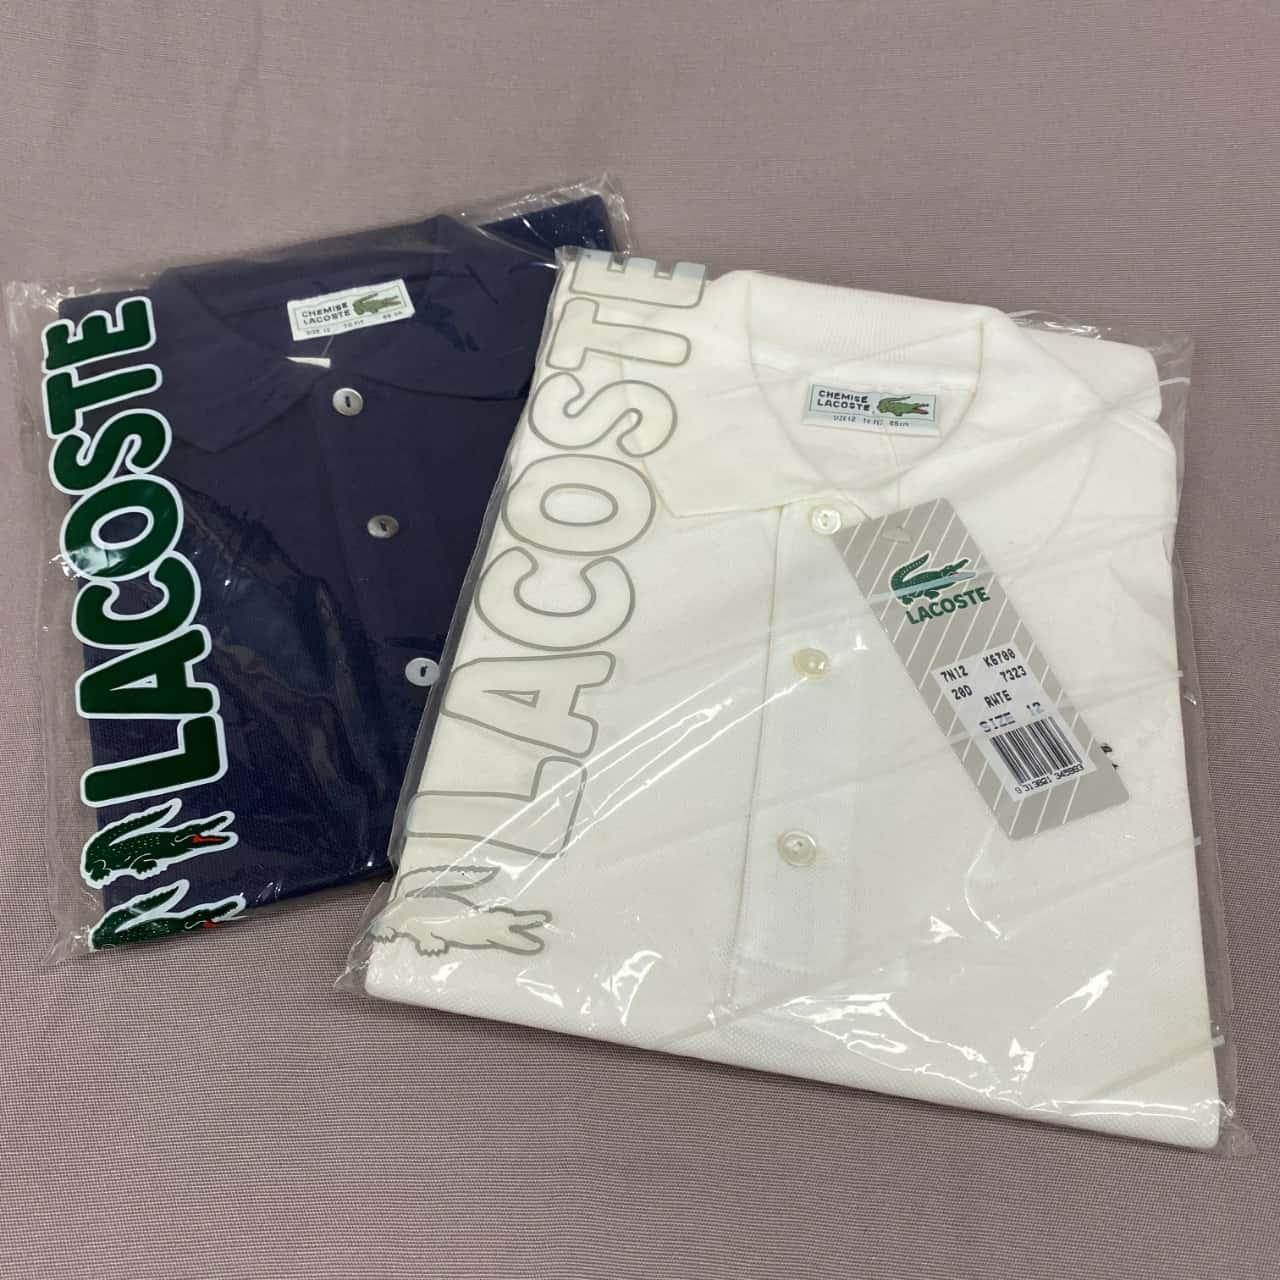 Lacoste Mens Navy & White Polo Shirt Size 12 Bundle Brand New